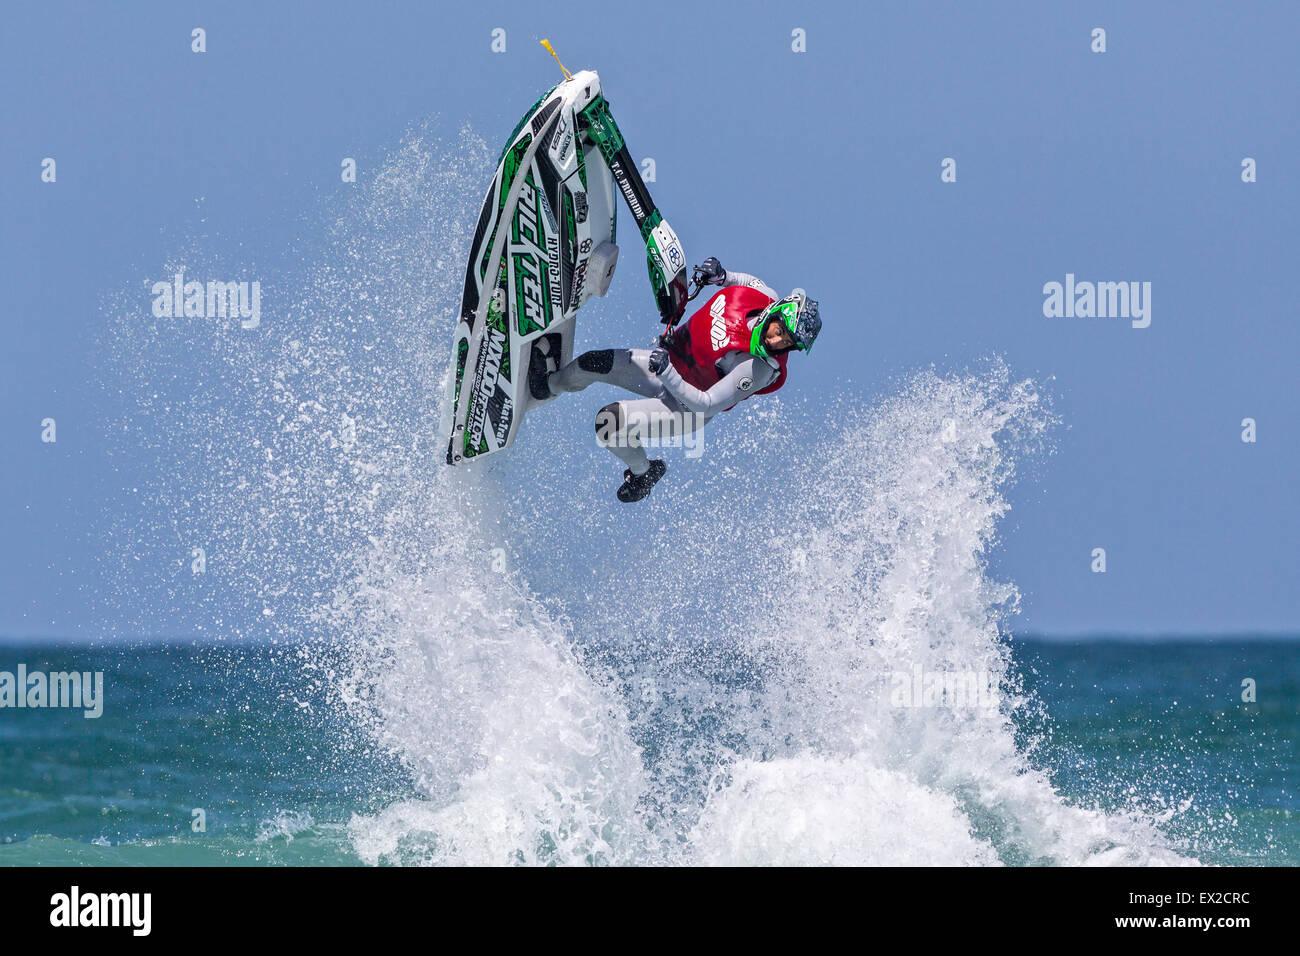 Fahrer bei IFWA Tour Jet Ski Weltmeisterschaft 2015, Fistral Strand, Cornwall, UK Stockbild